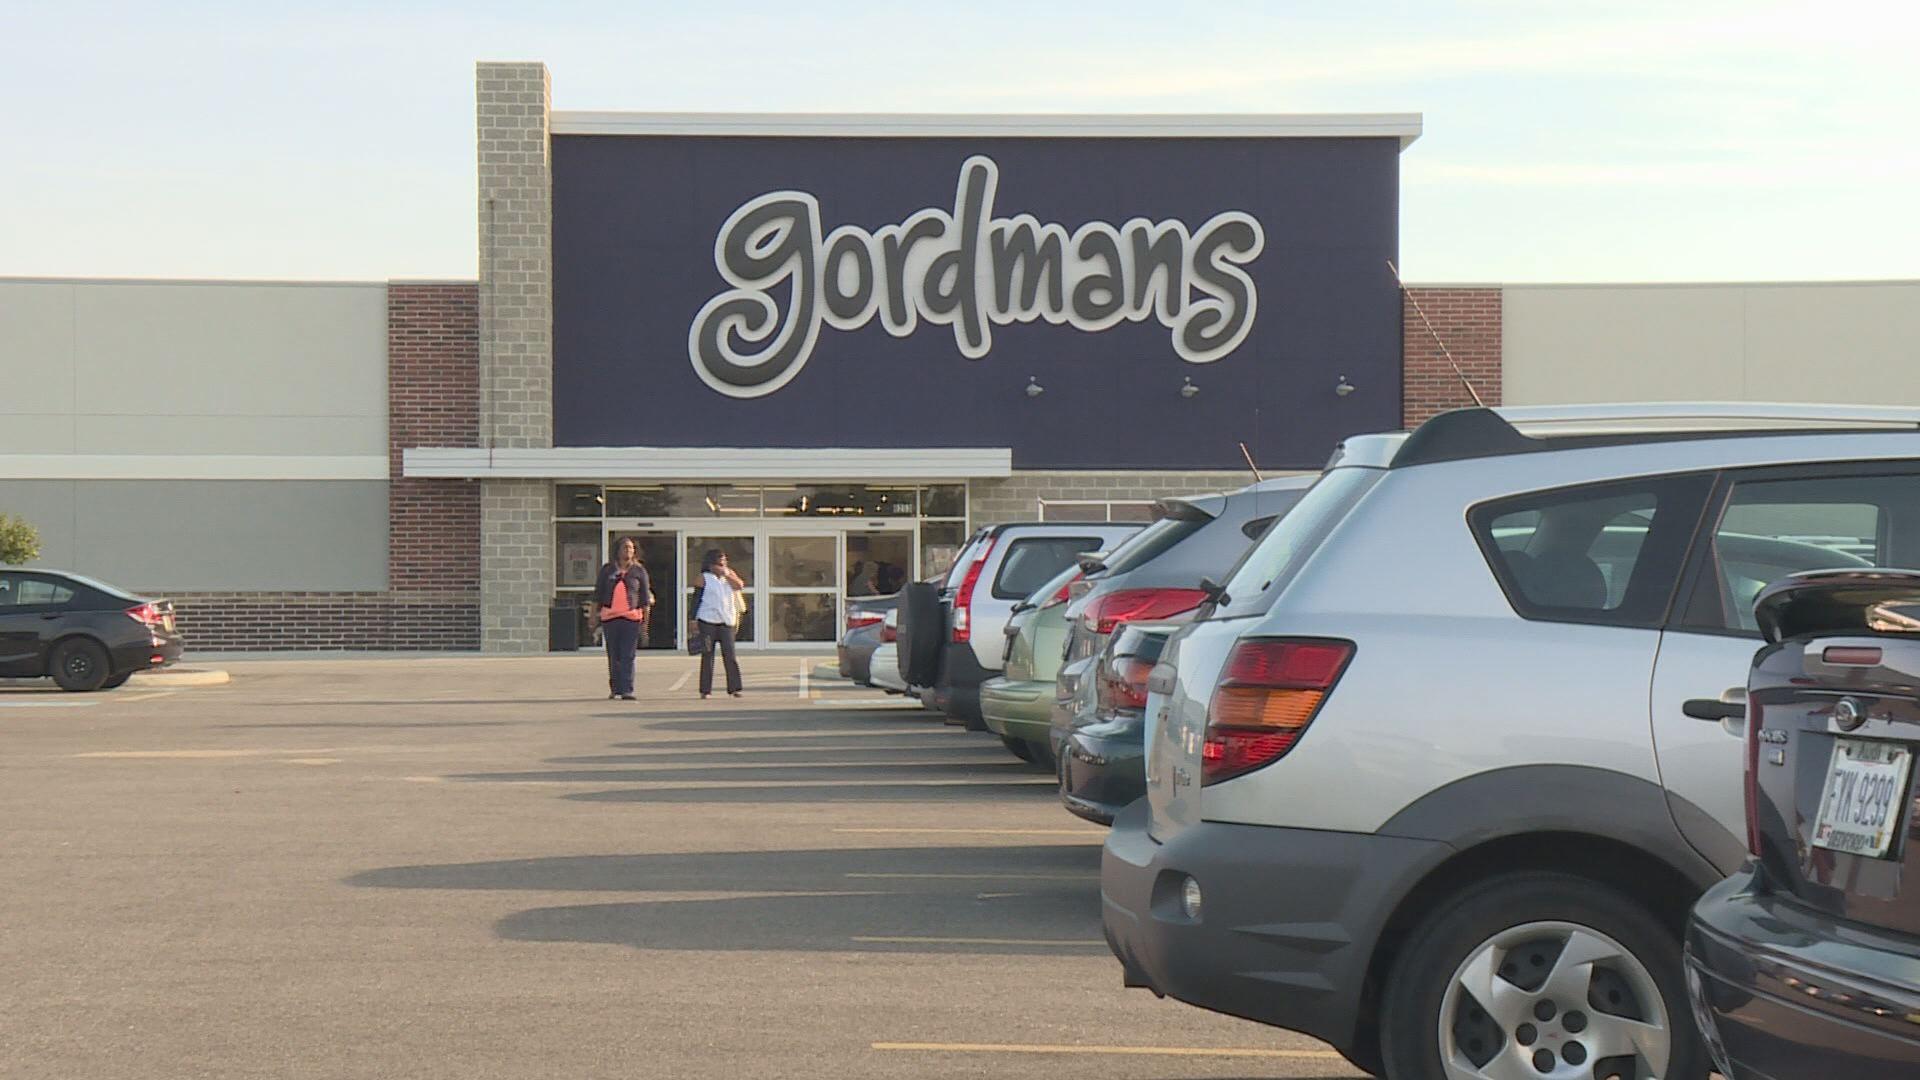 Shop gordmans online